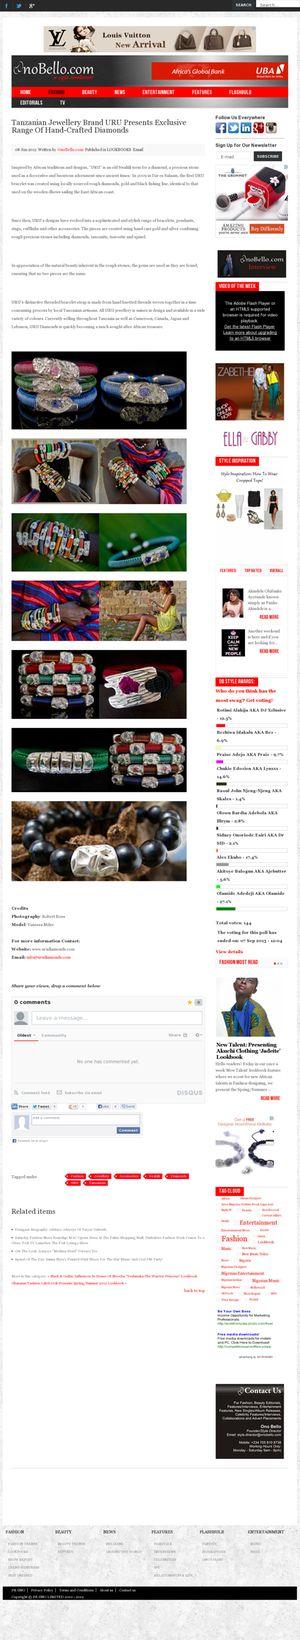 Onobella.com article about URU Bracelets